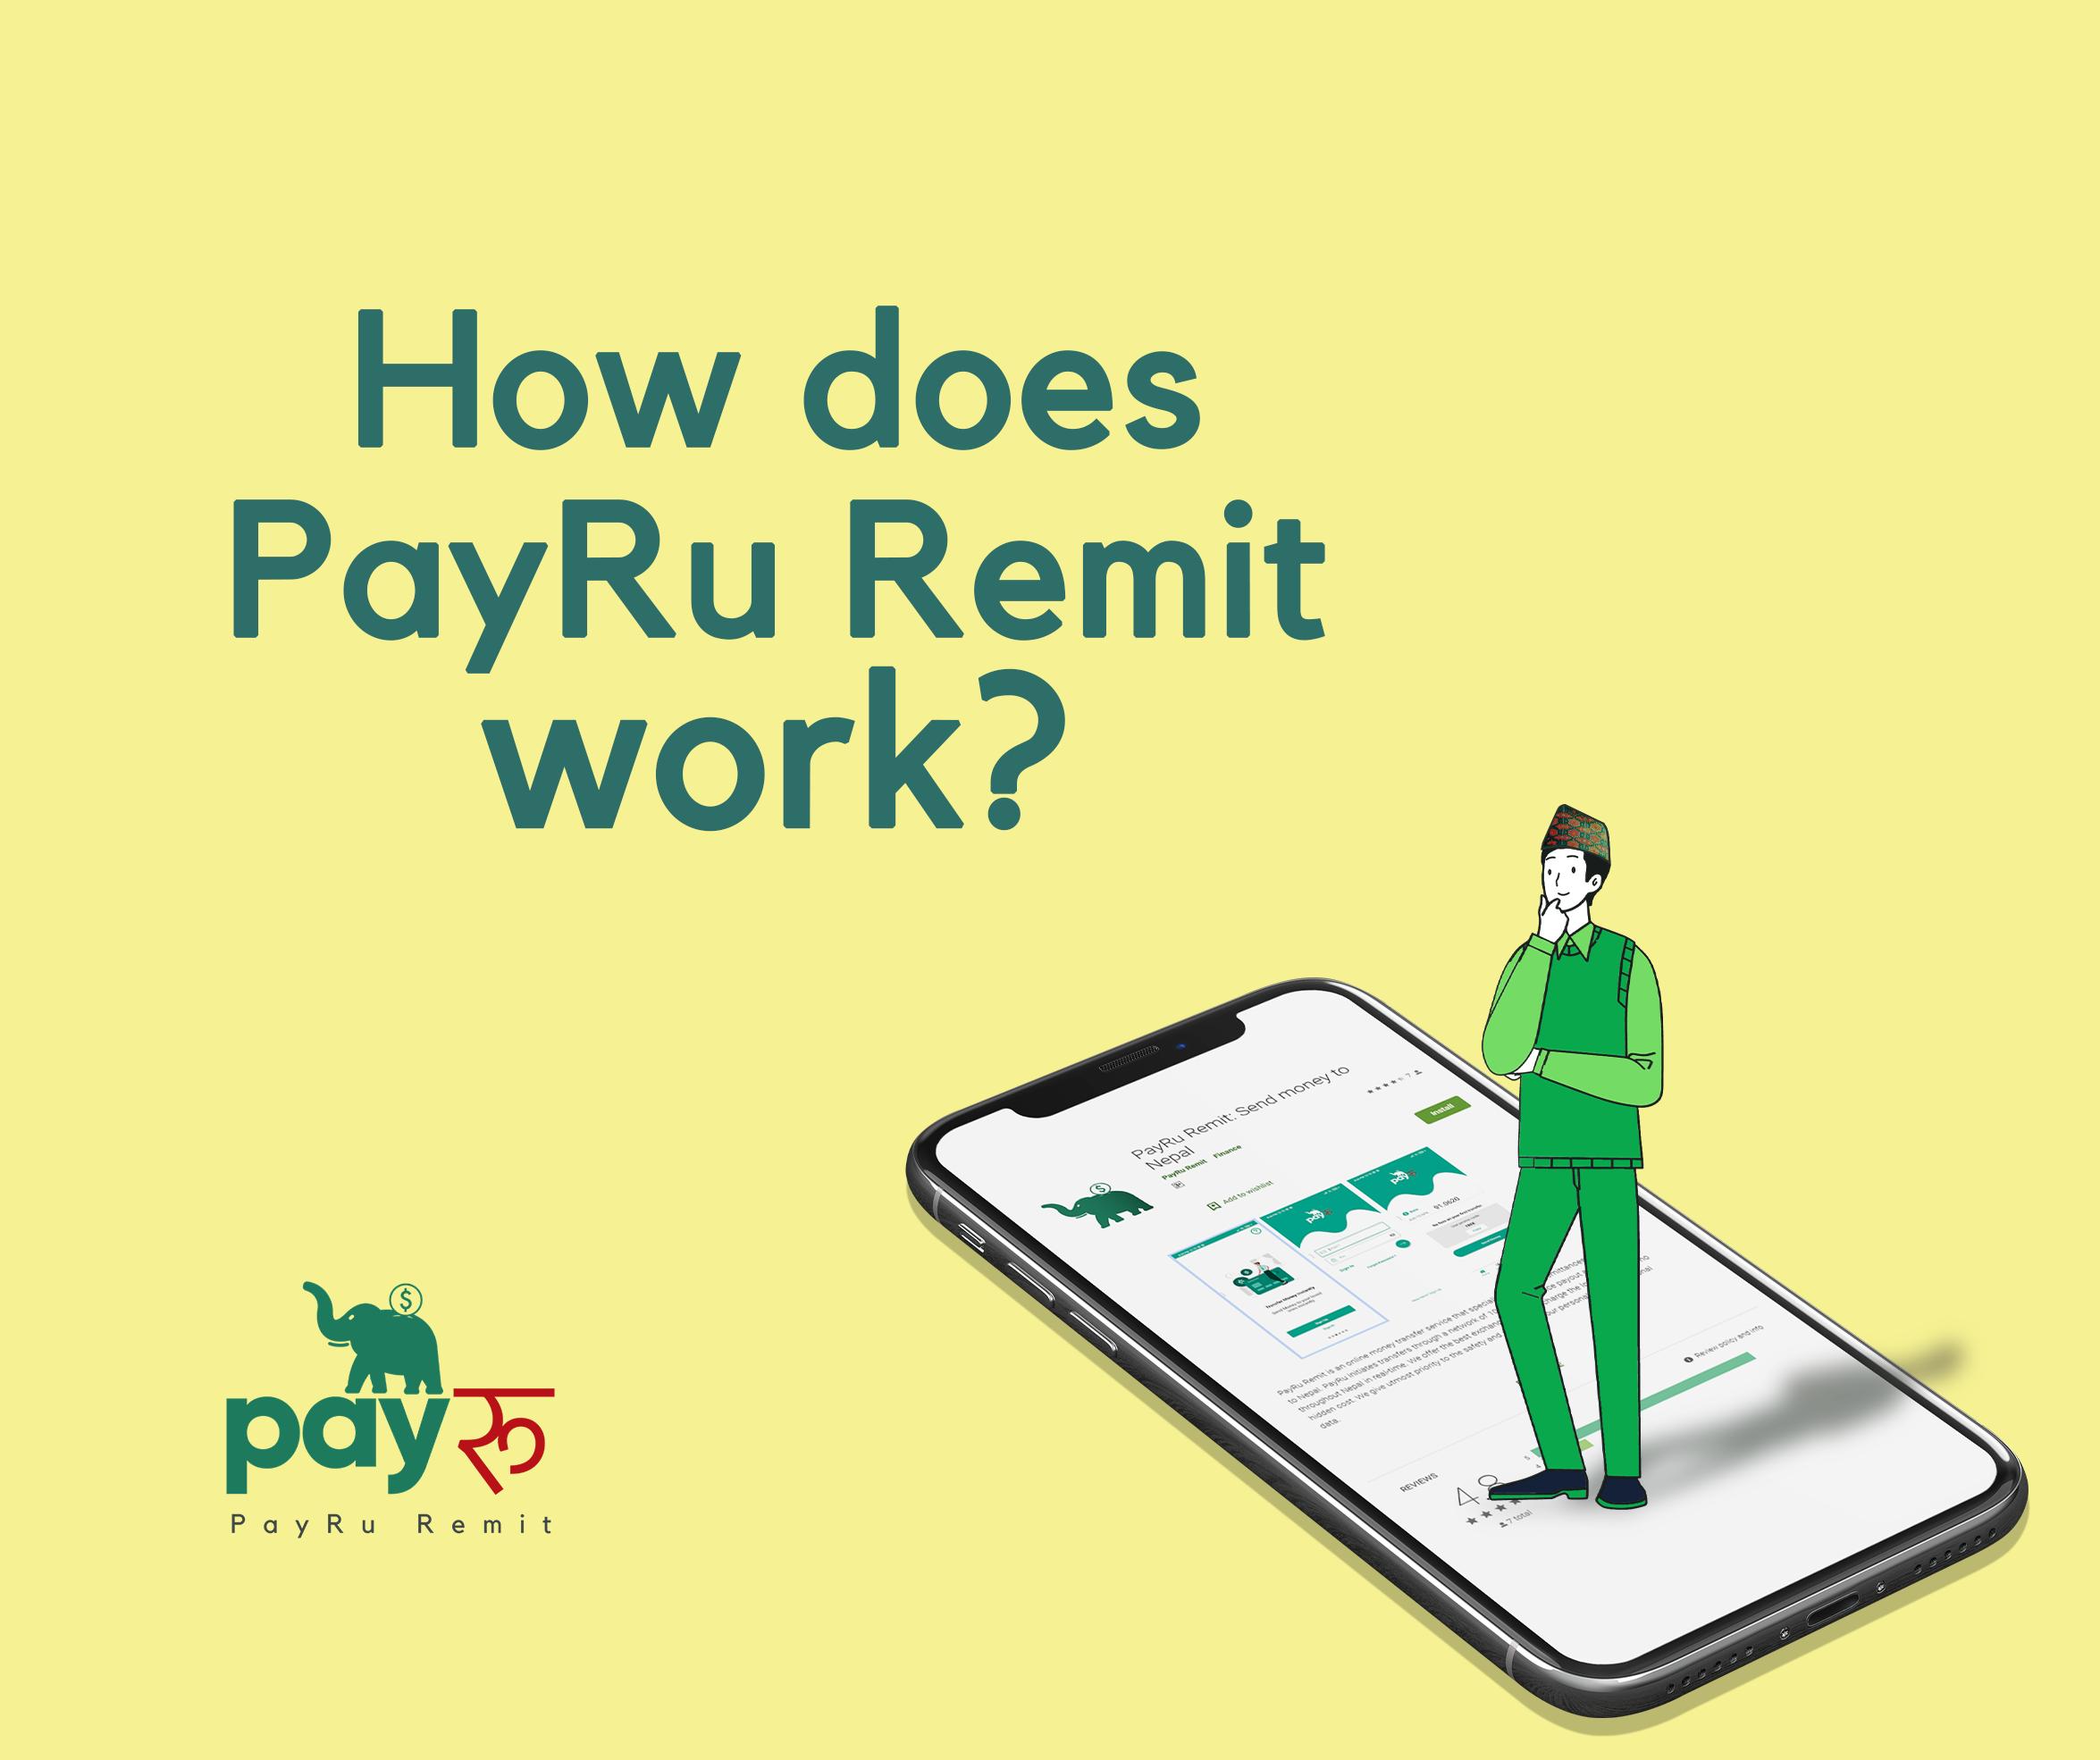 How payru works